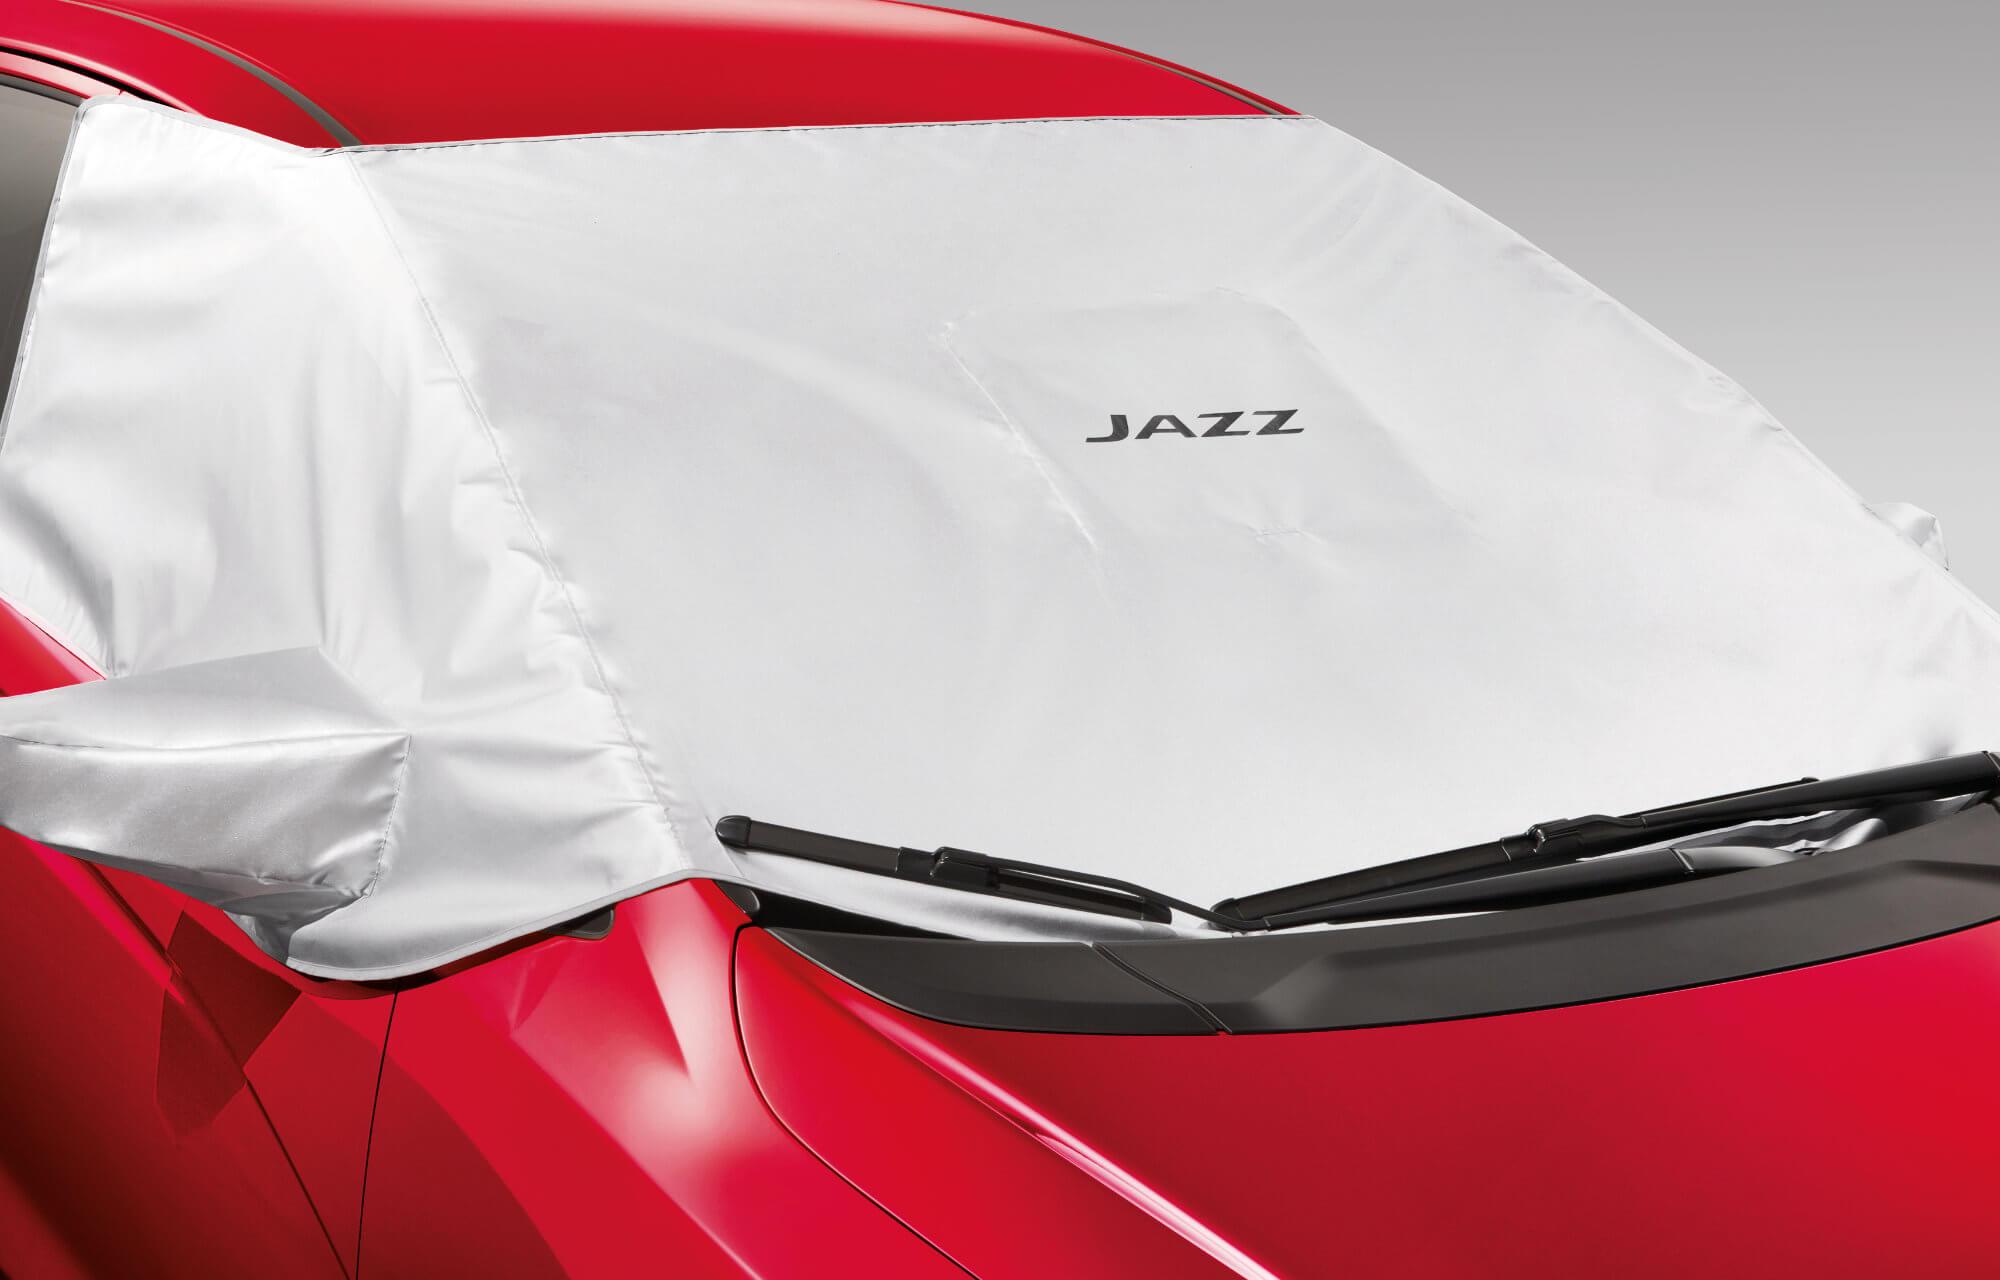 Honda Jazz Windshield Cover